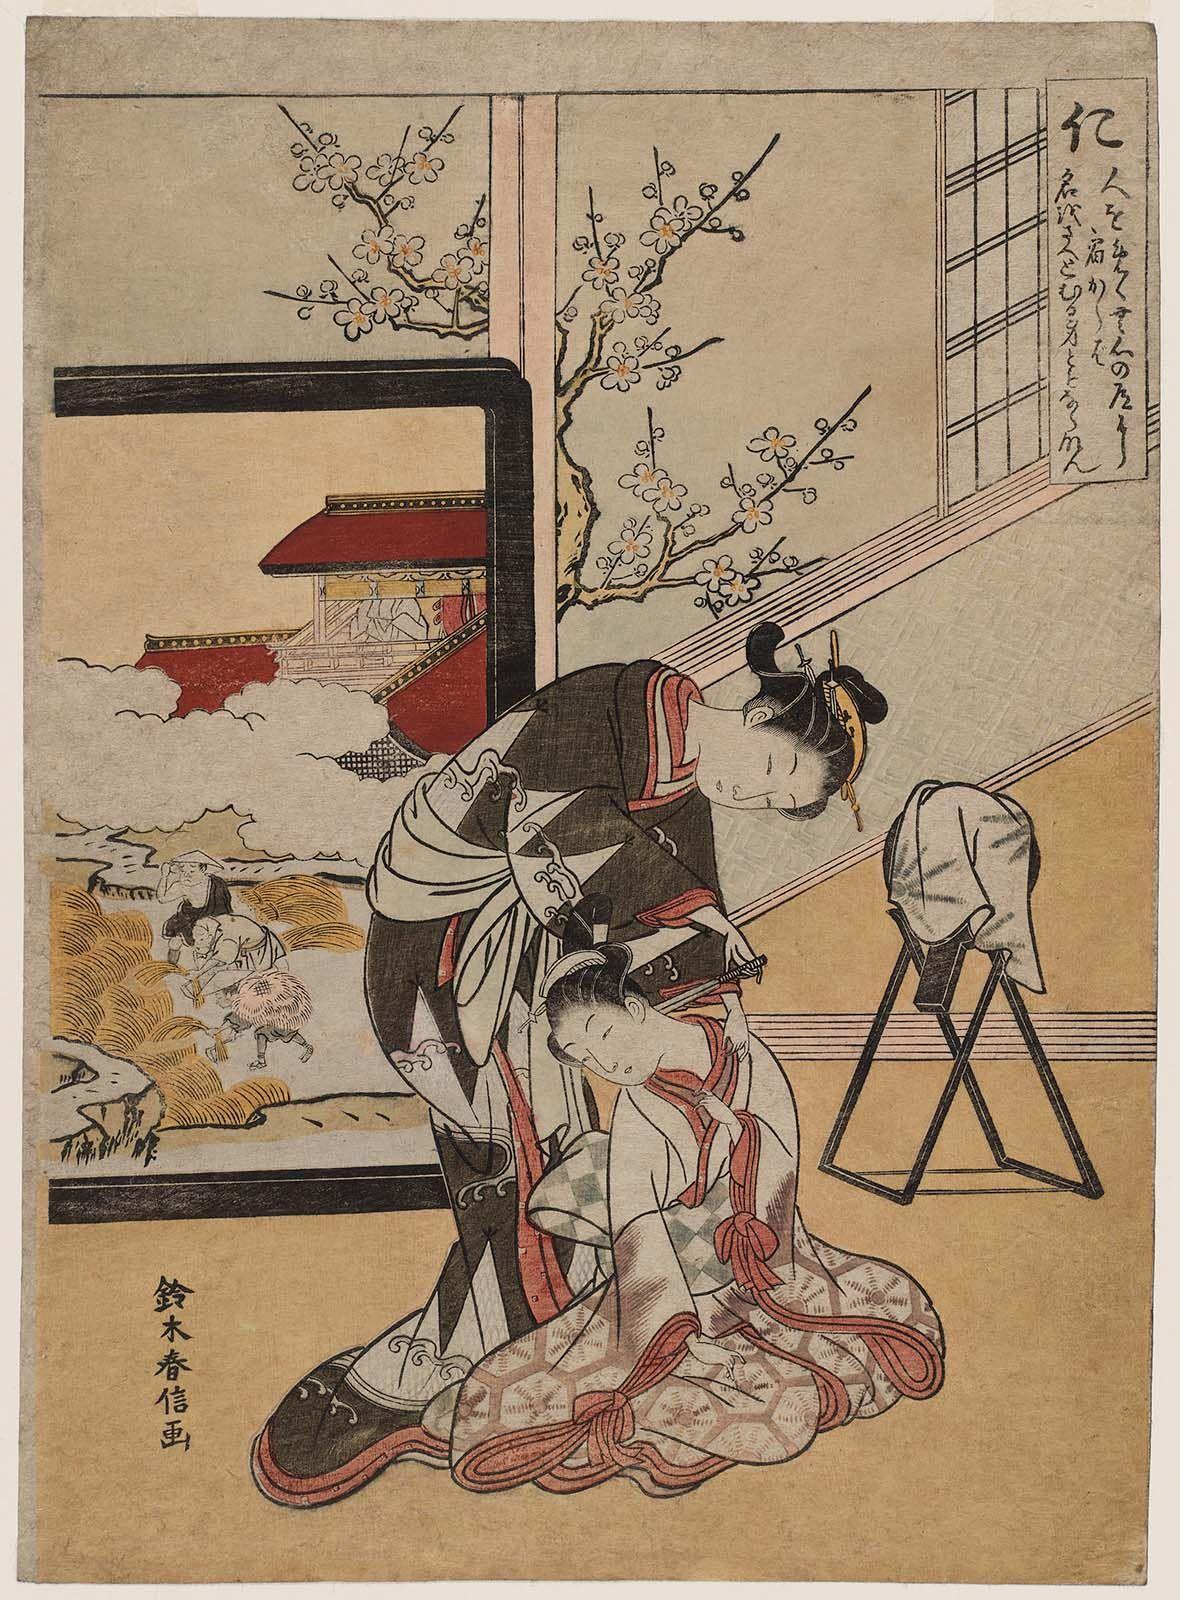 Benevolence (Jin), from the series The FIve Virtues (Gojô) 1767 (Meiwa 4) Artist Suzuki Harunobu,